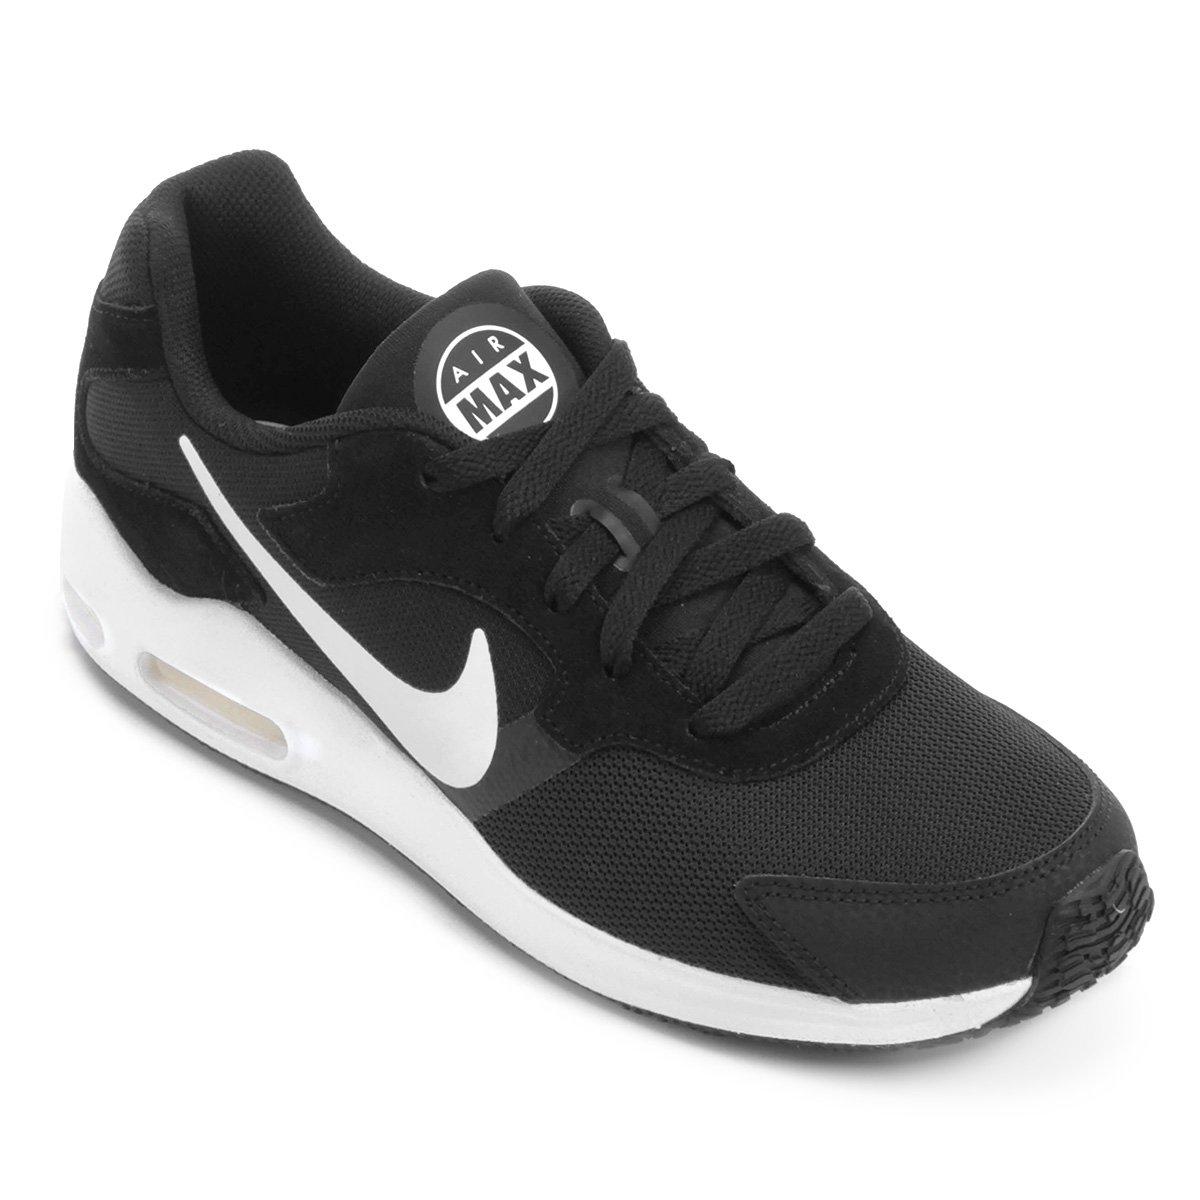 San Francisco 7f3b5 678a7 Tênis Nike Air Max Guile Masculino - Branco e Preto